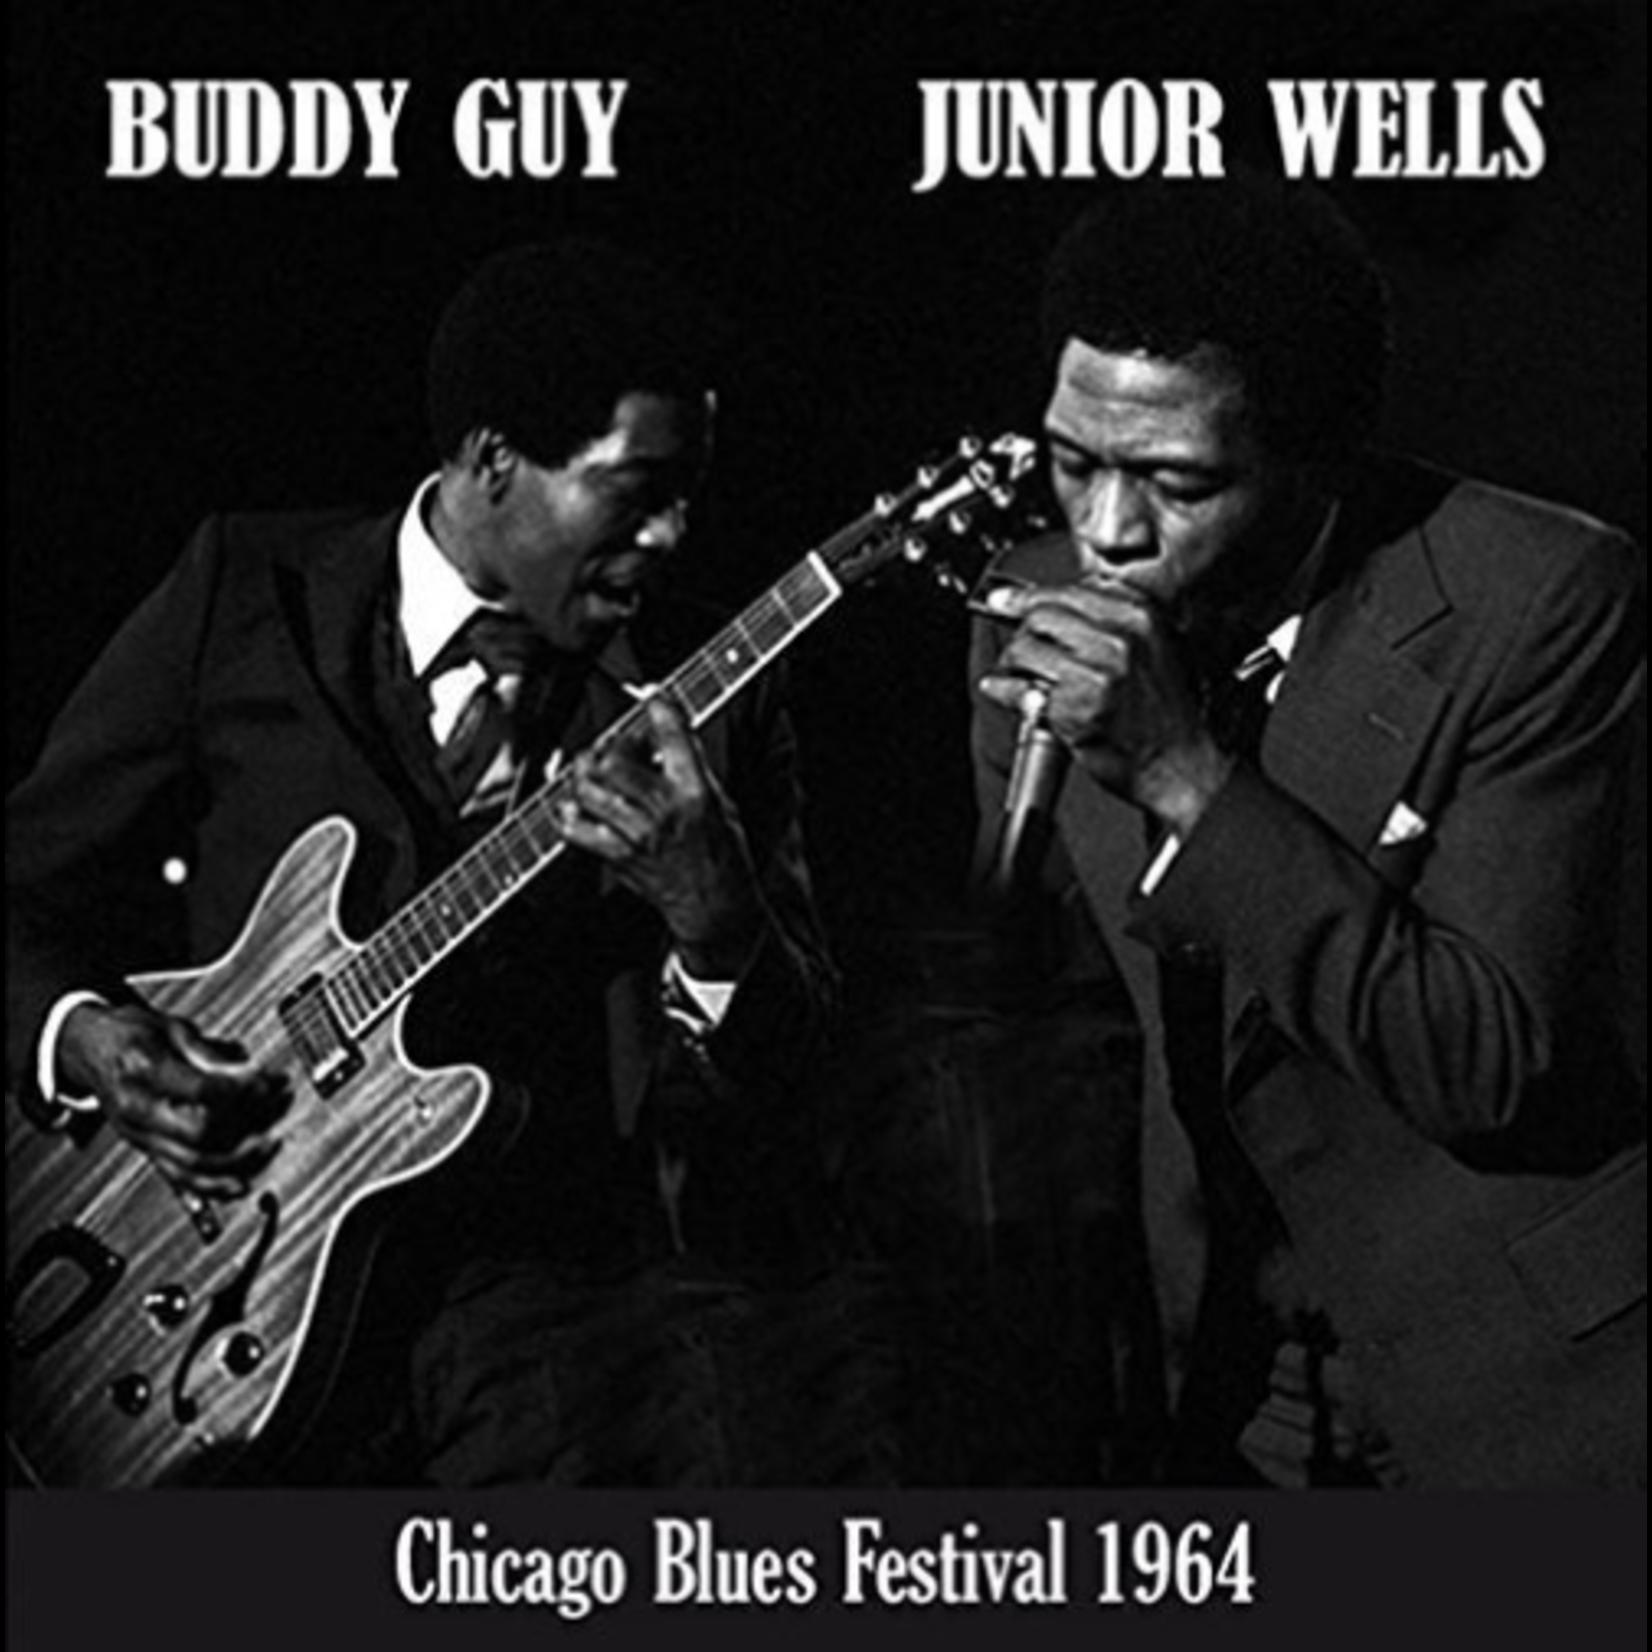 BUDDY GUY CHICAGO BLUES FESTIVAL 1964